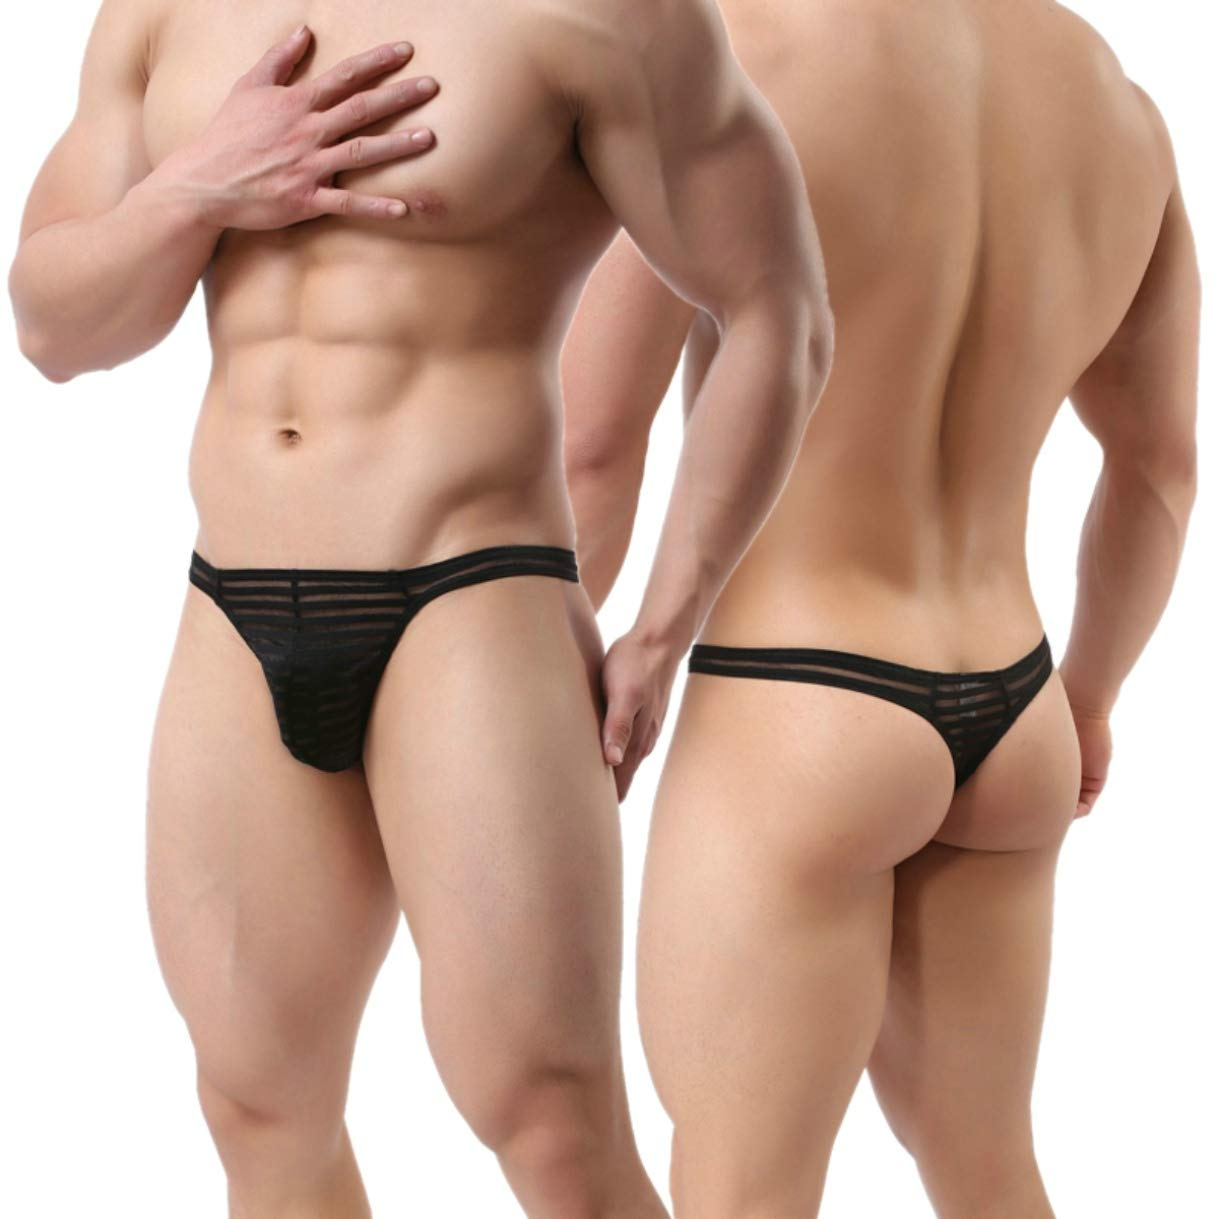 MuscleMate UltraHot Through Underwear G String